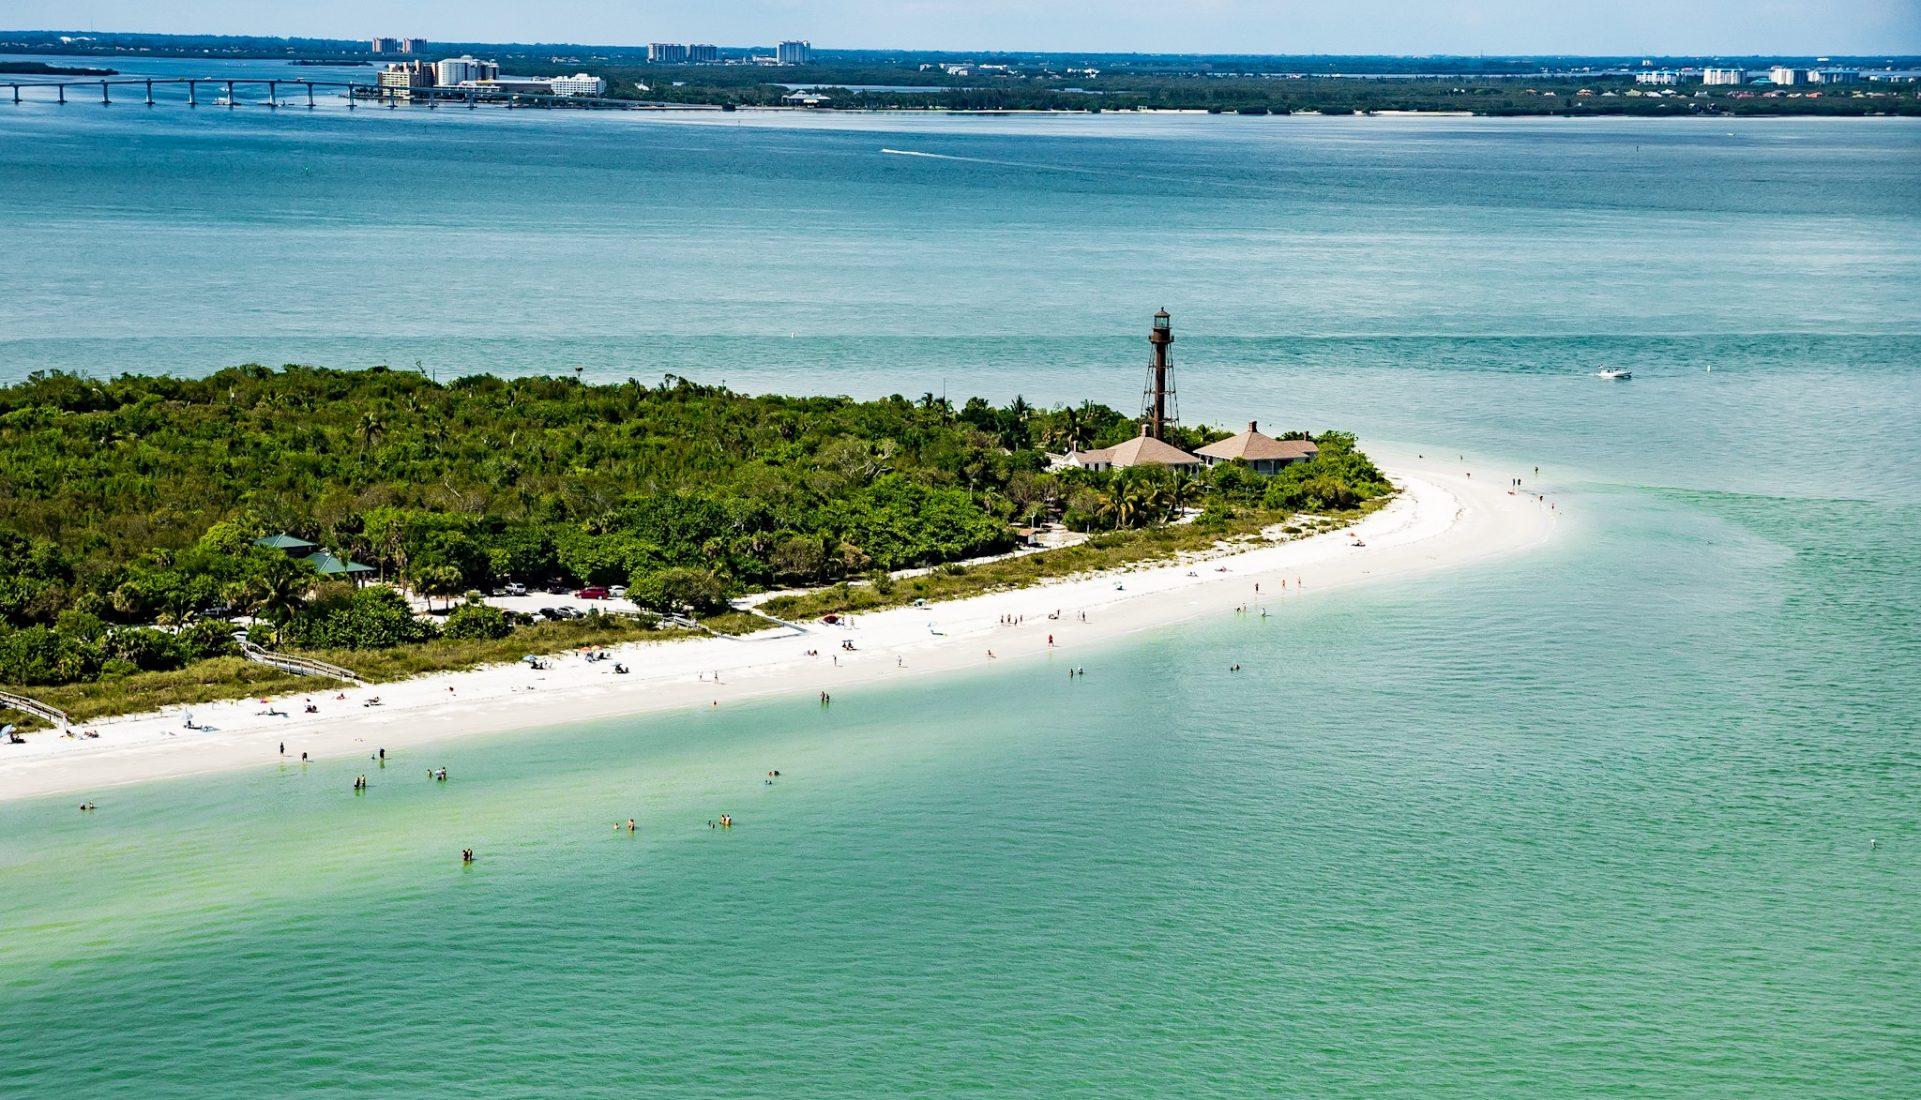 Sanibel Island Light and Boca Grande Lighthouse stand as sentinels for Pine Island Sound